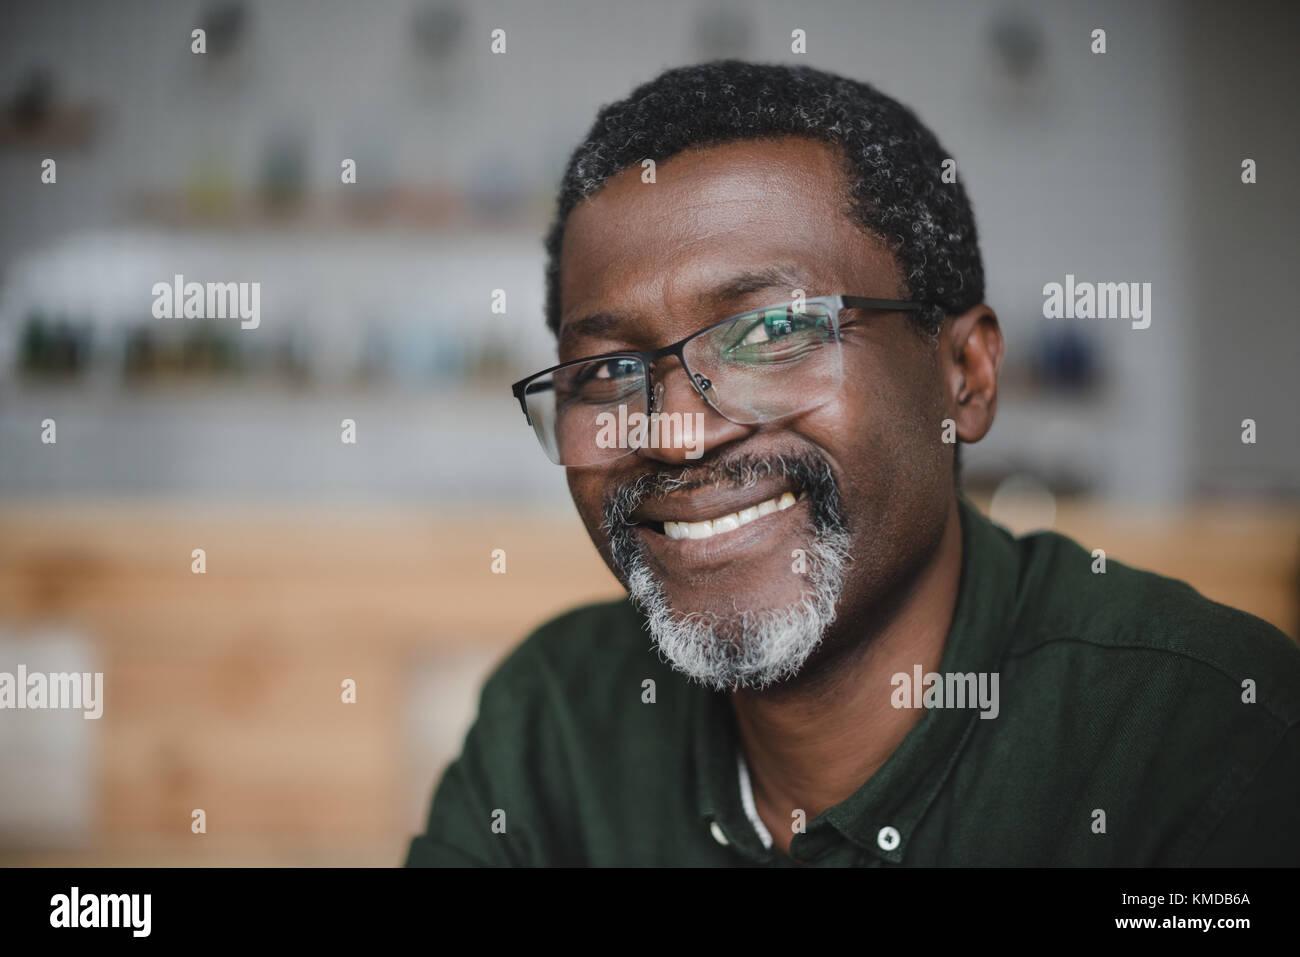 Coppia African American uomo in bar Foto Stock